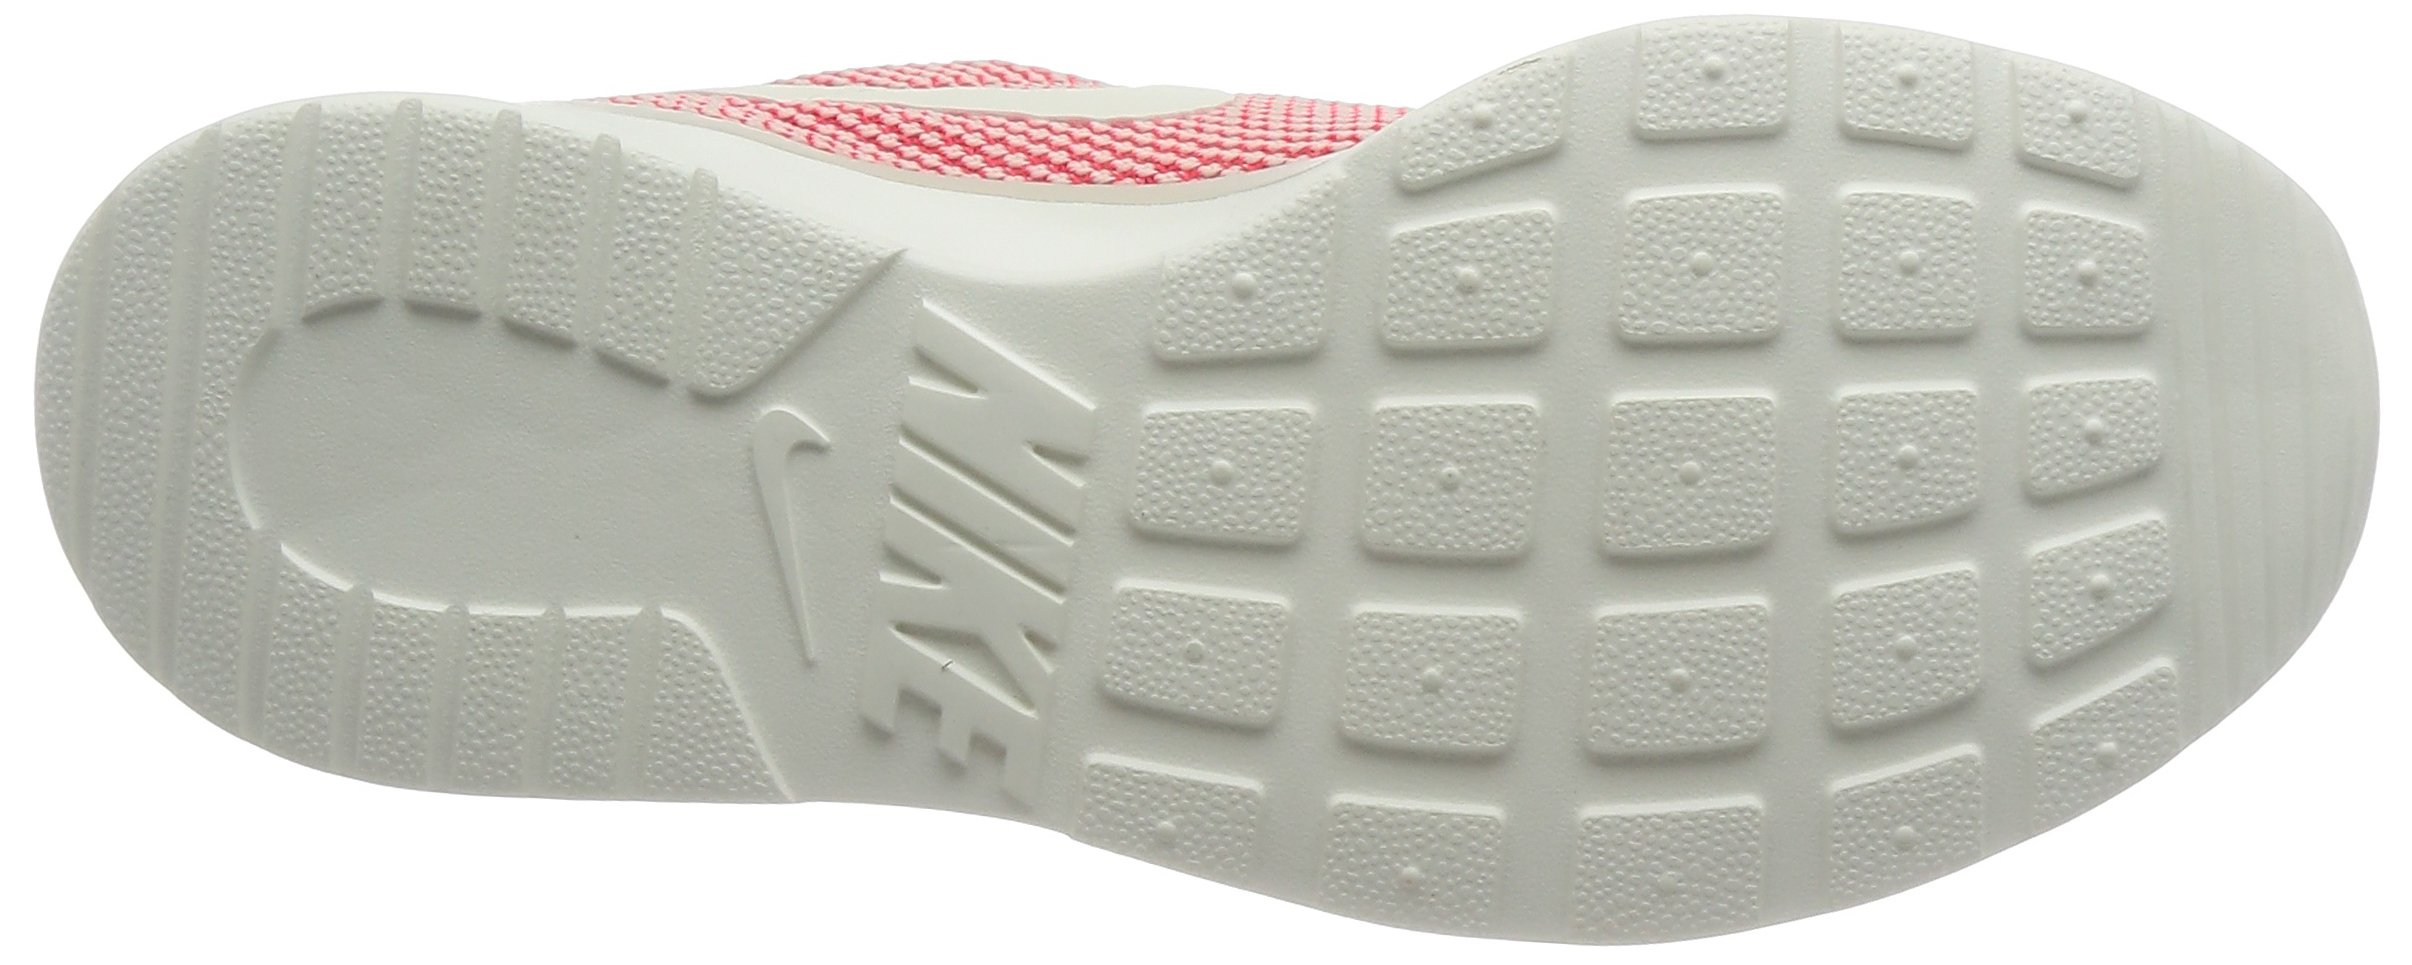 Nike 921668-101 : Women's Orewood Tanjun Racer Running Shoe LT Orewood Women's Brown a7da96